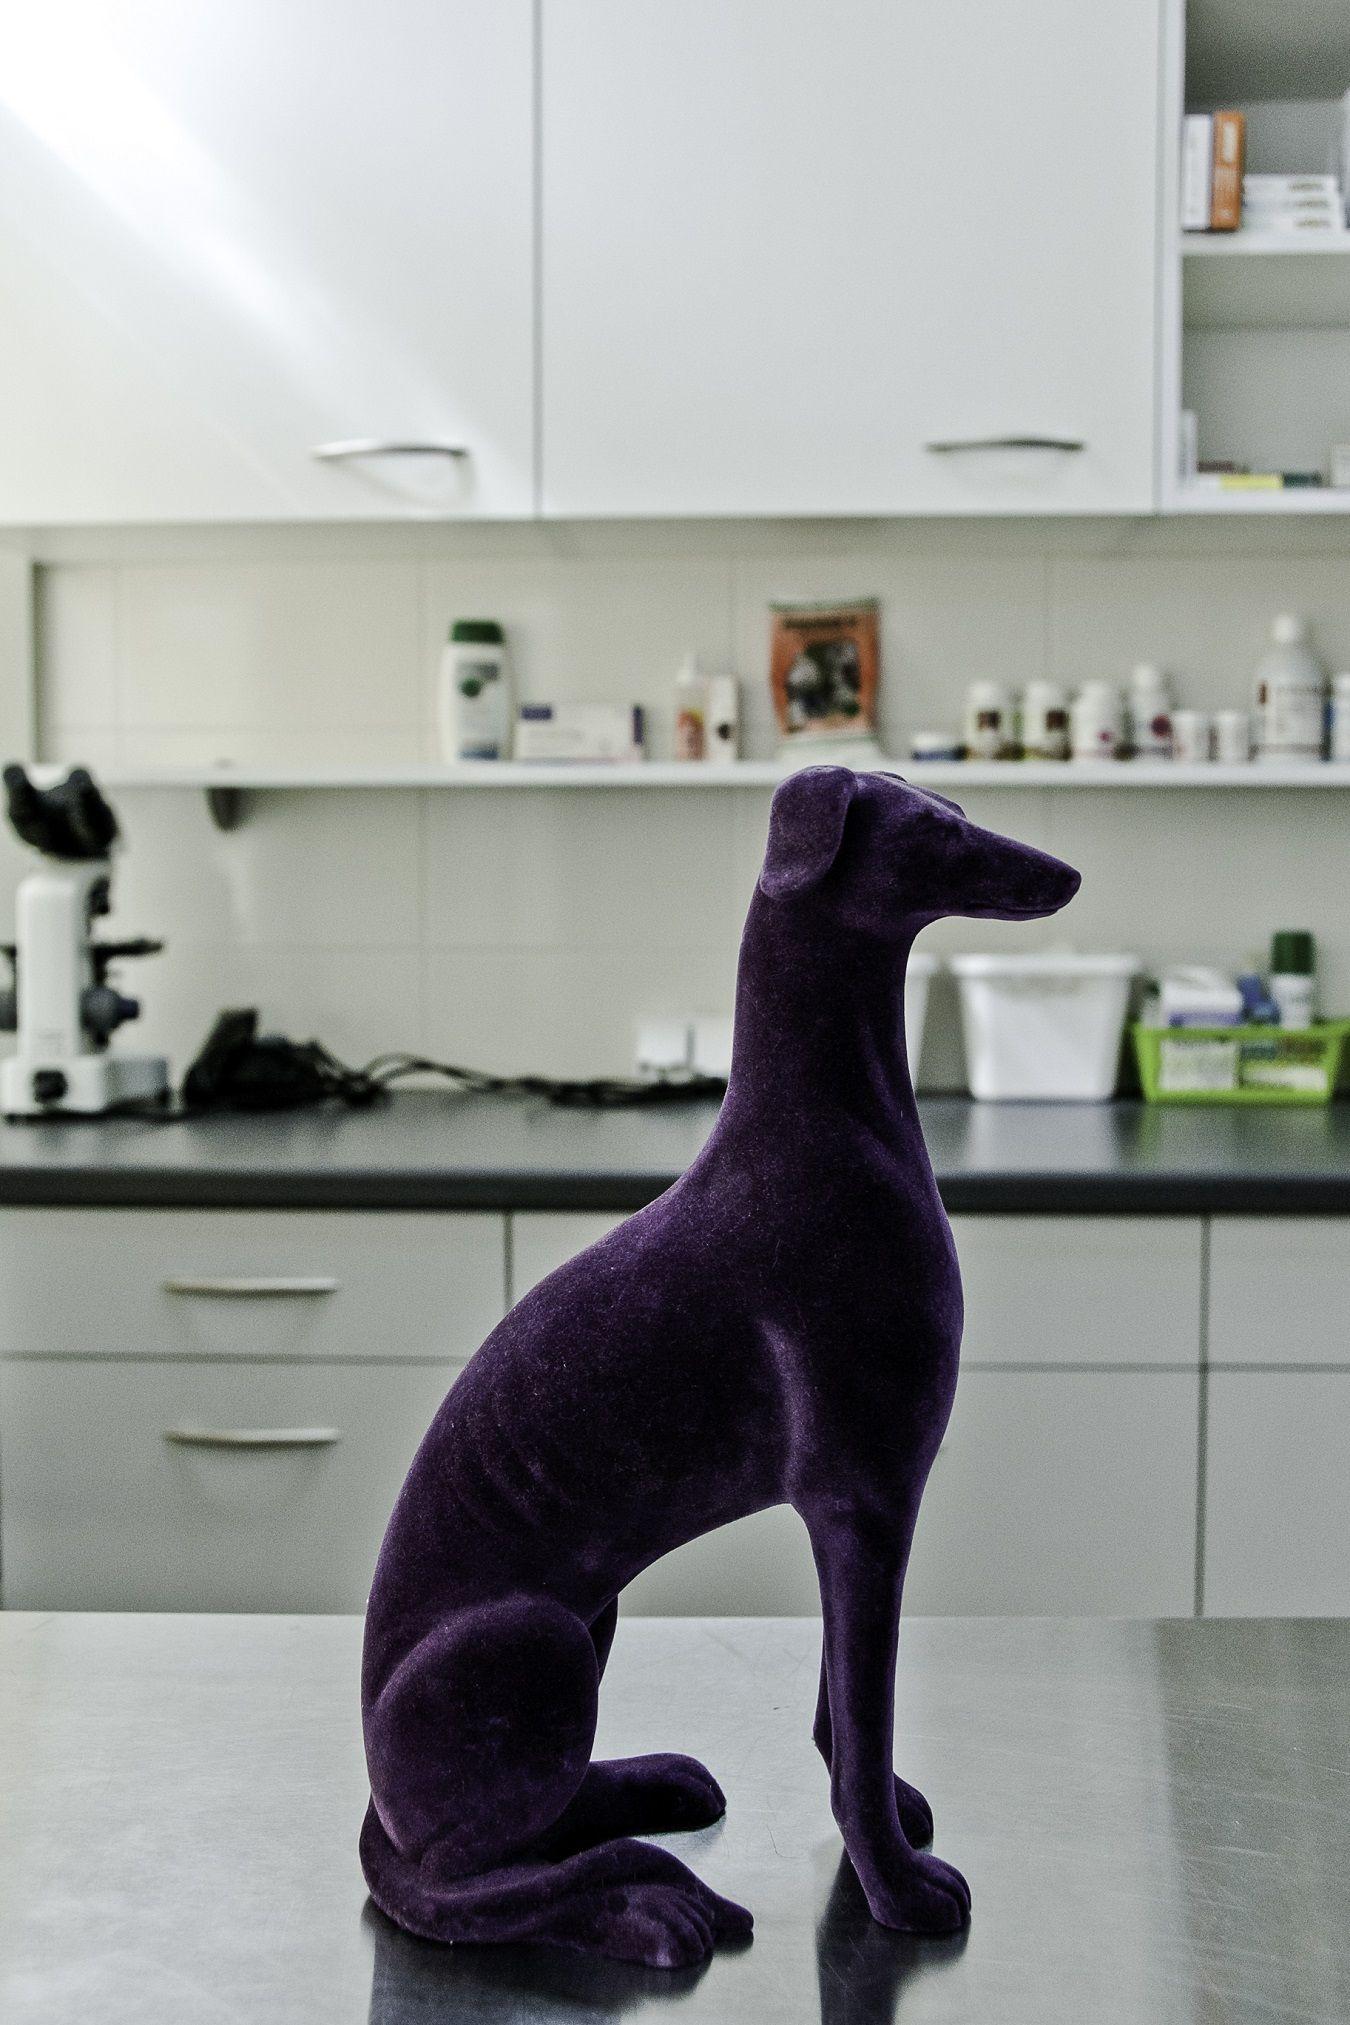 24h Omega VET Veterinary Clinic Clinic, Dinosaur stuffed